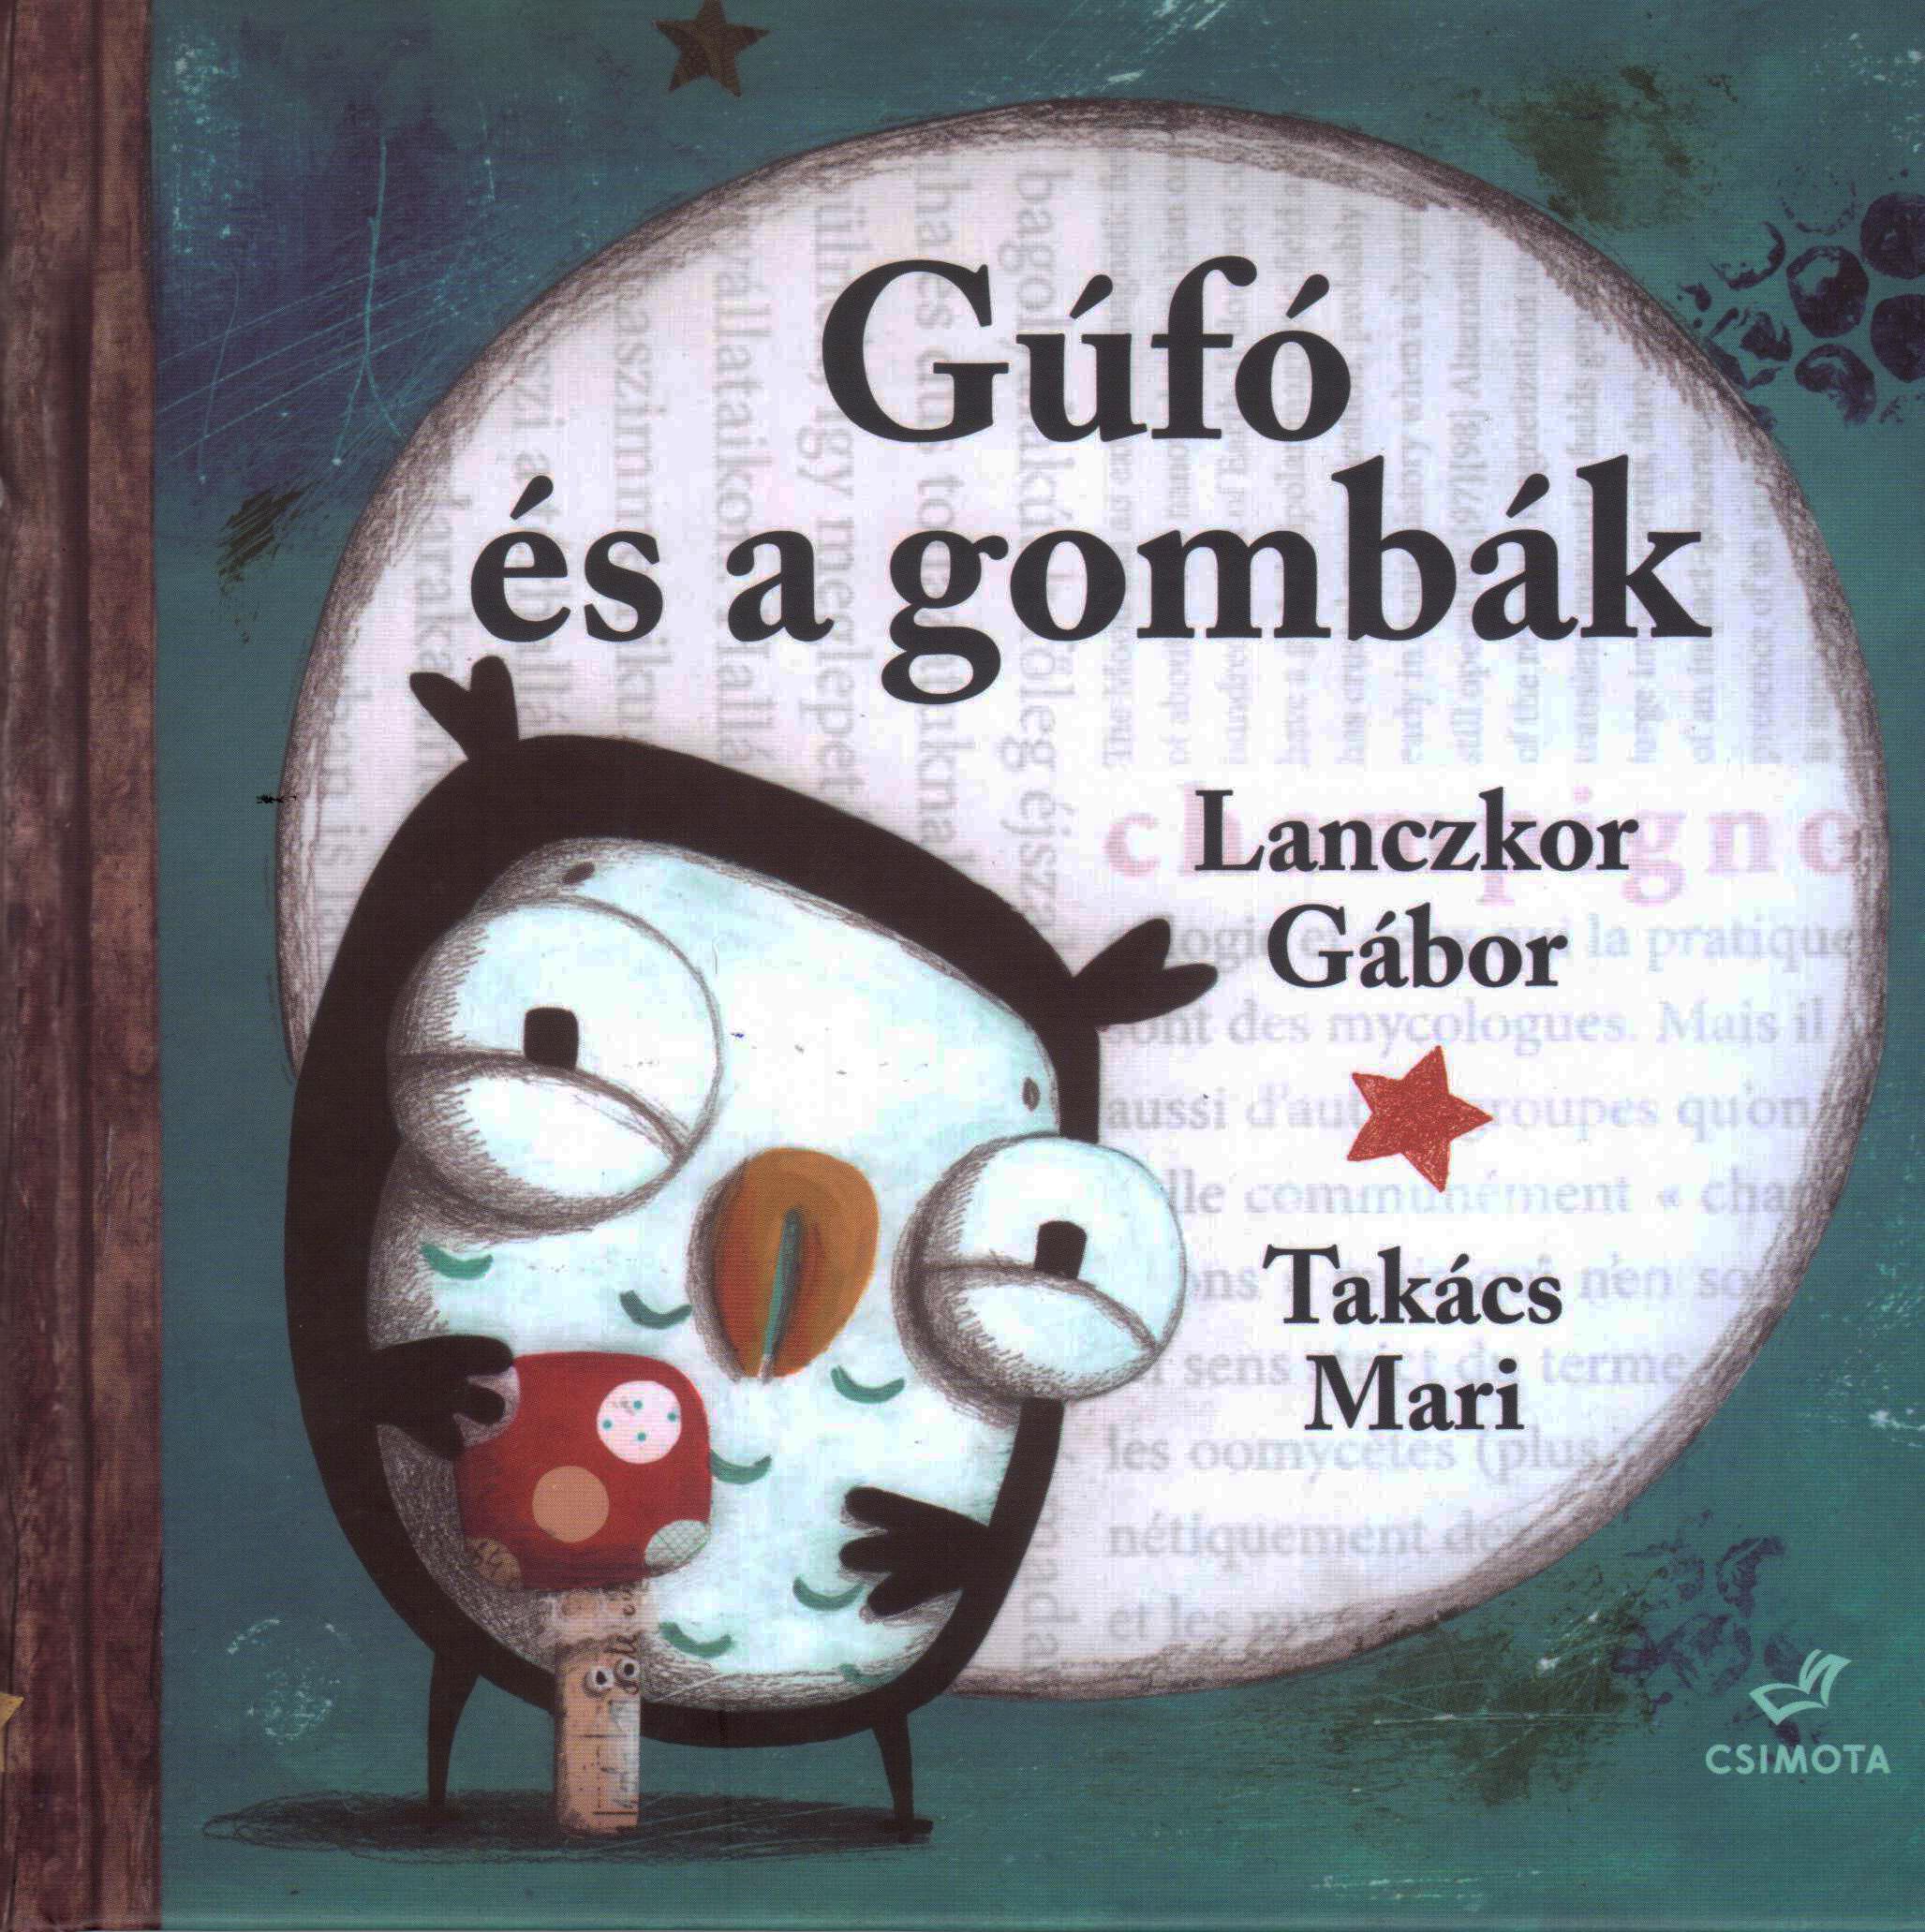 gufo_es_a_gombak.jpg